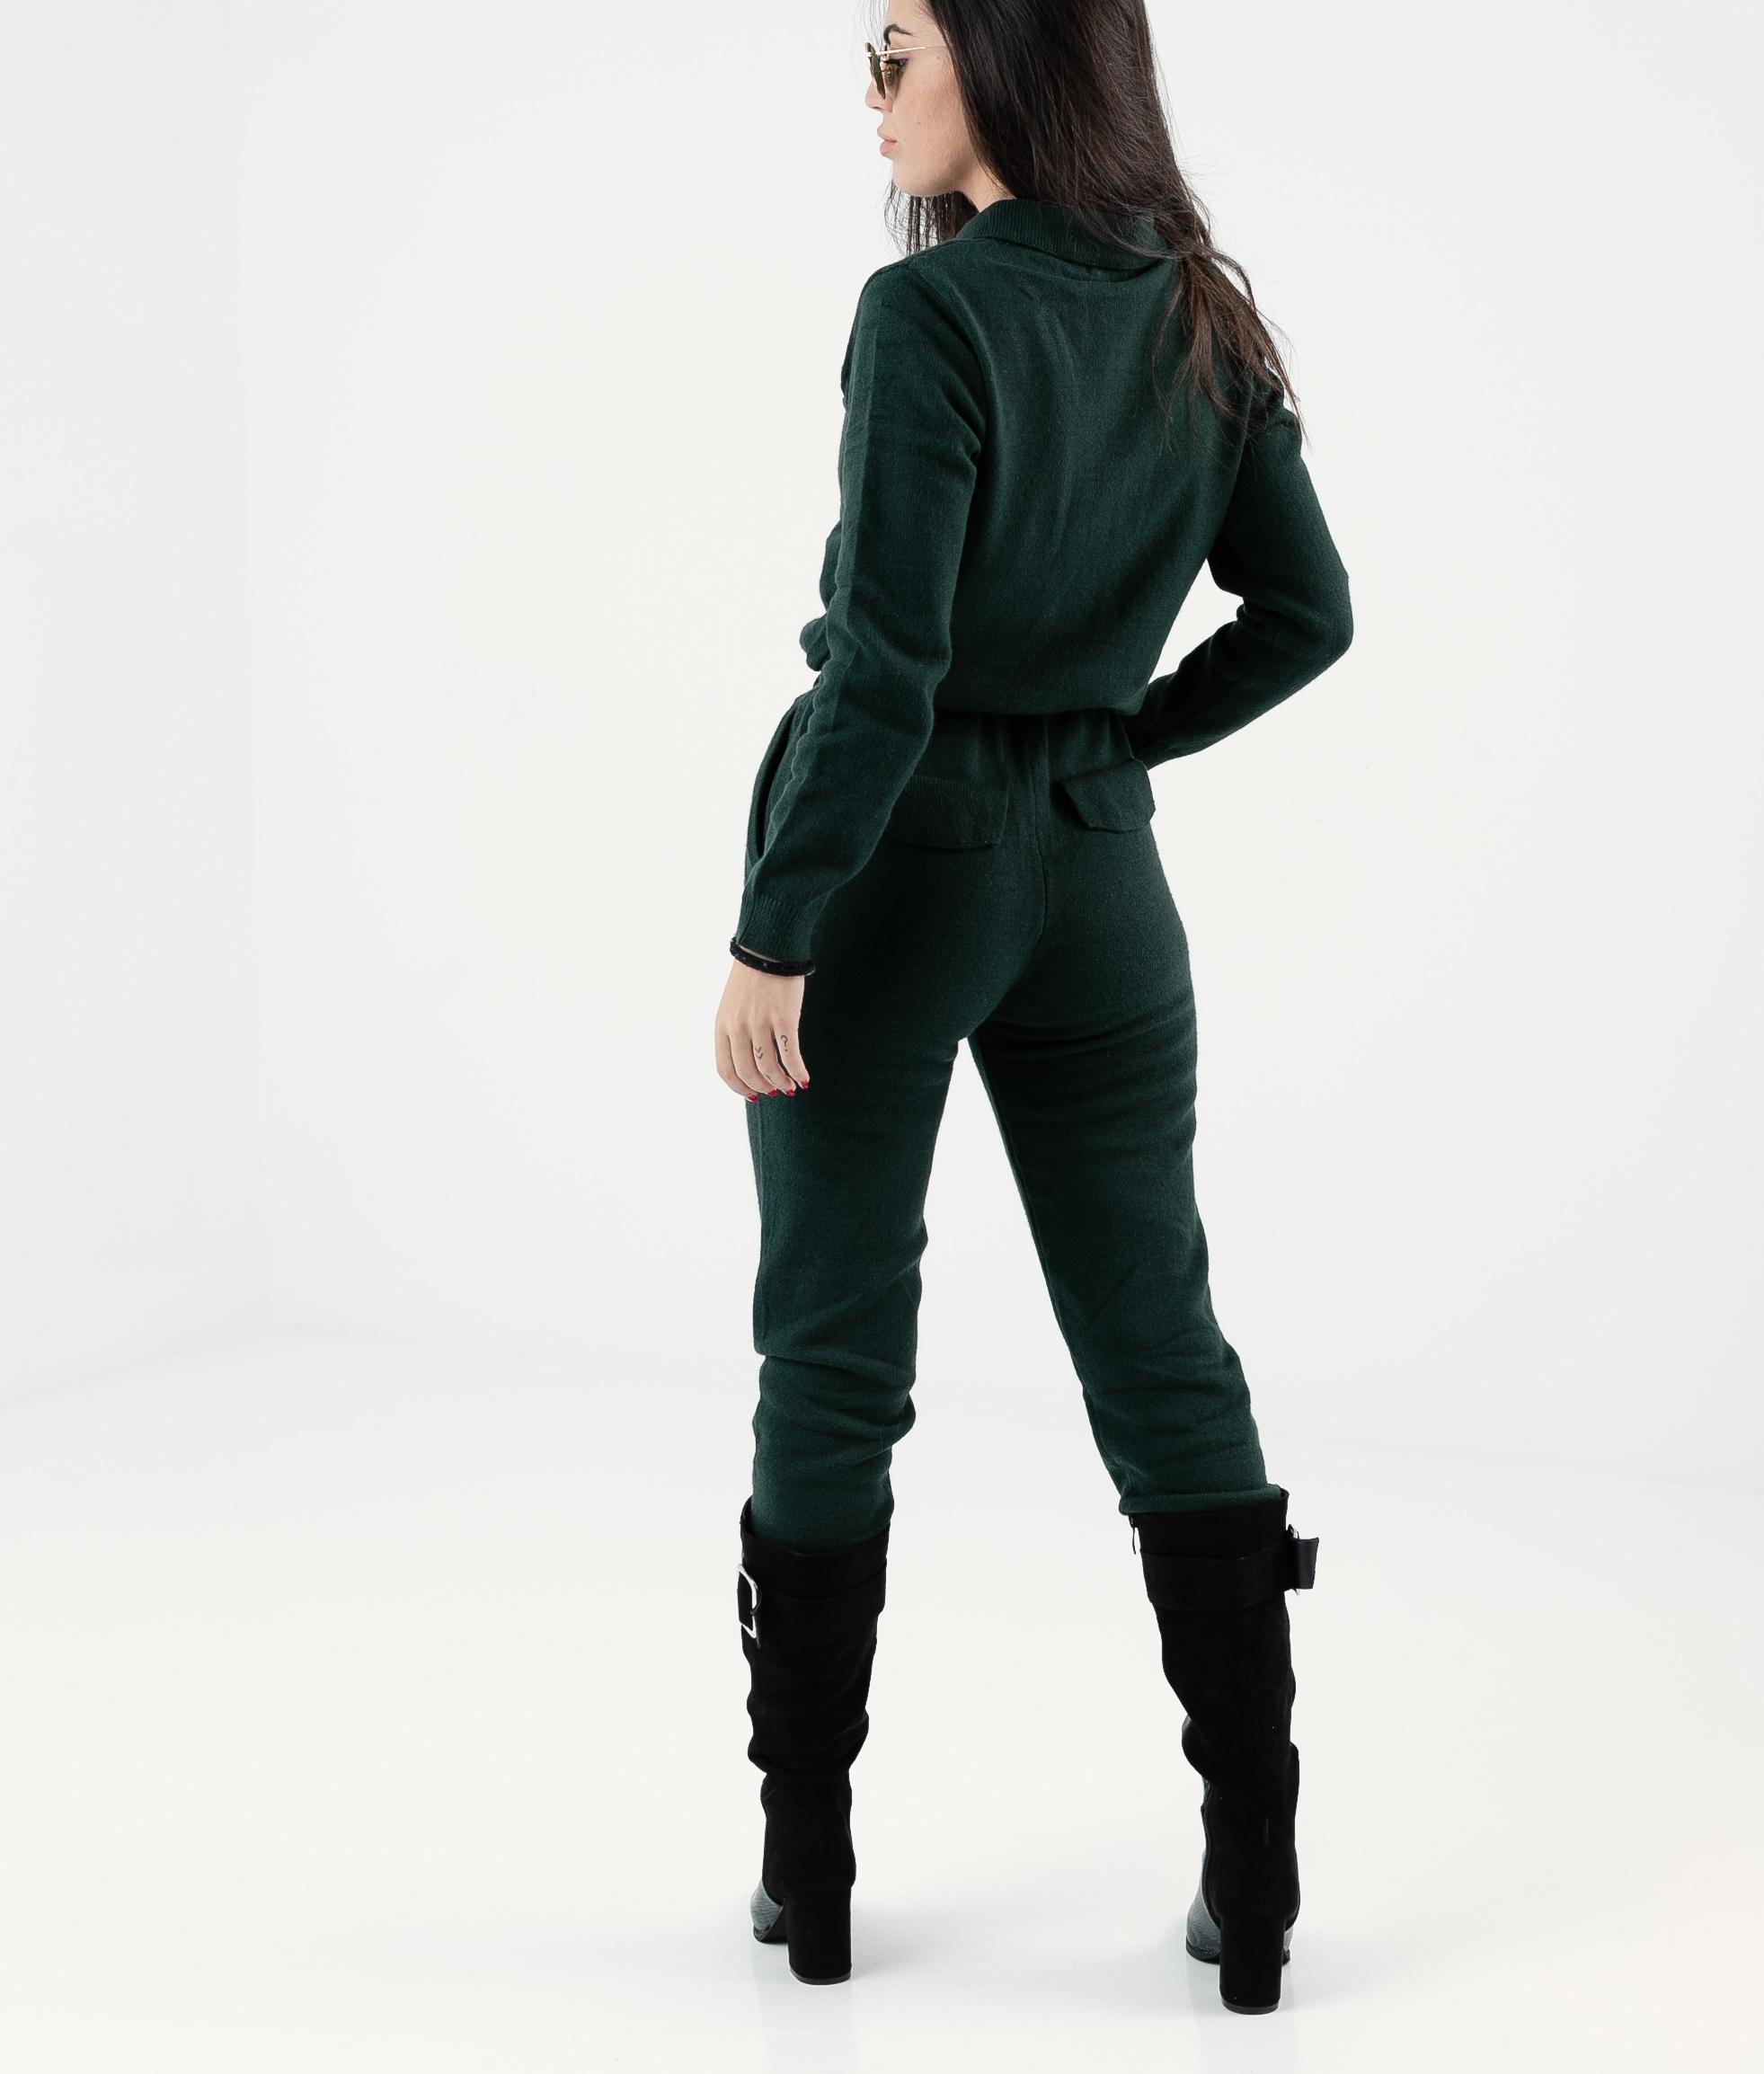 Rodis Jumpsuit - Green